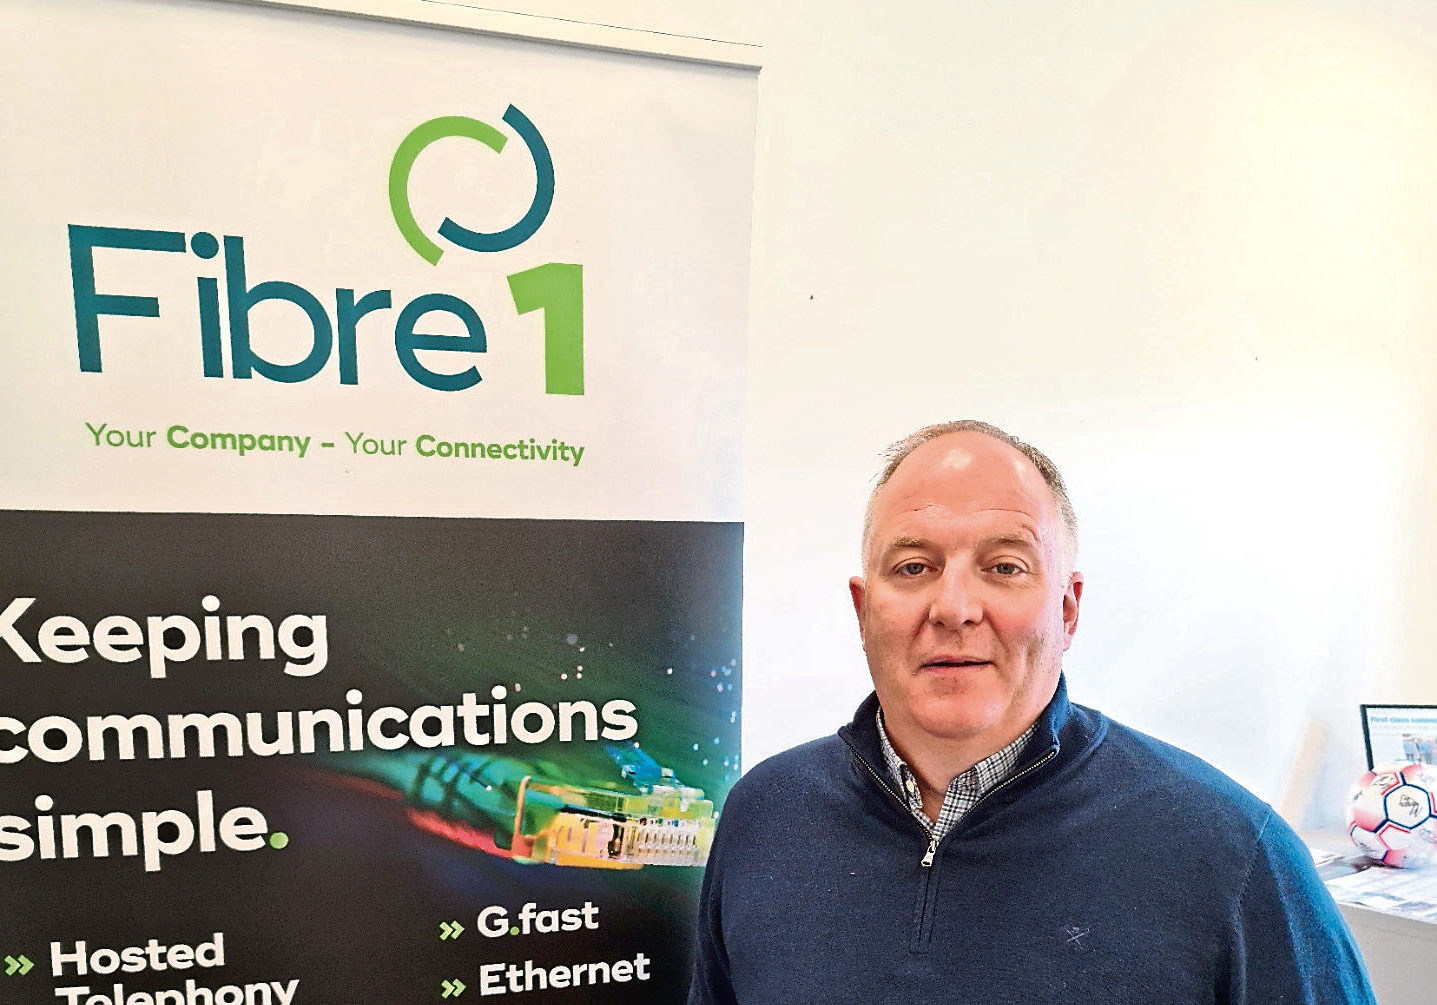 Stewart Macdonald, managing director of Fibre 1